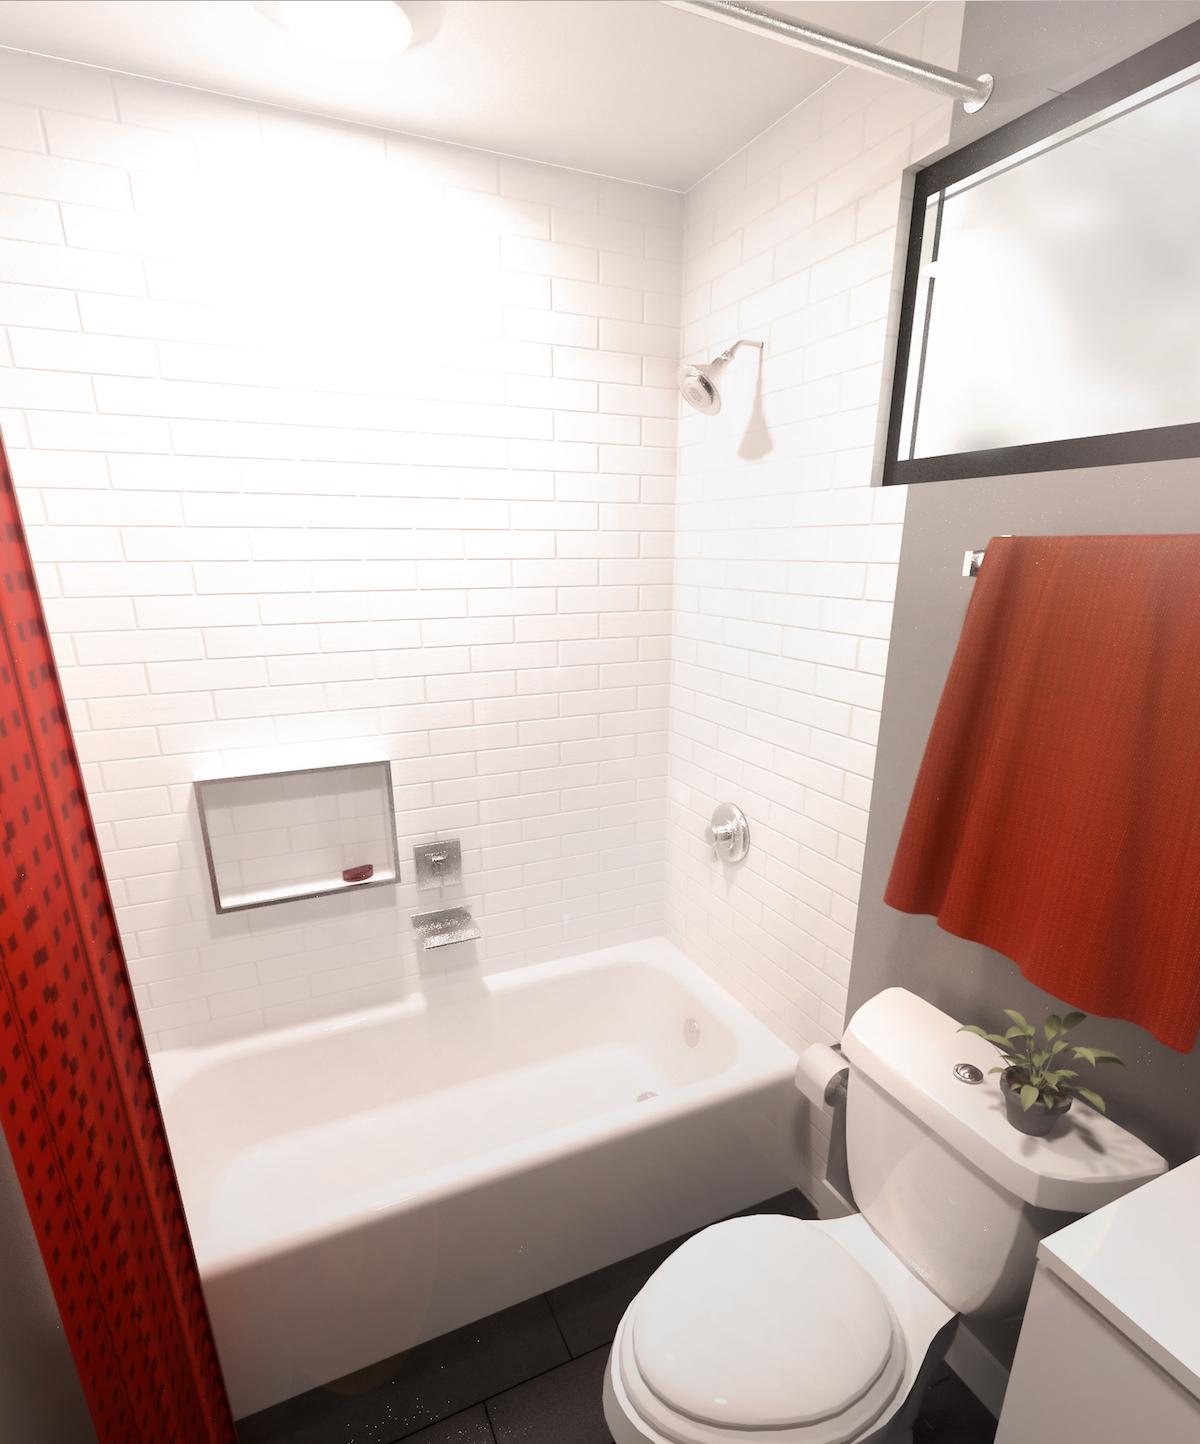 Thomas-Greiman-1254-Perry-Bathroom-B-copy-2_web